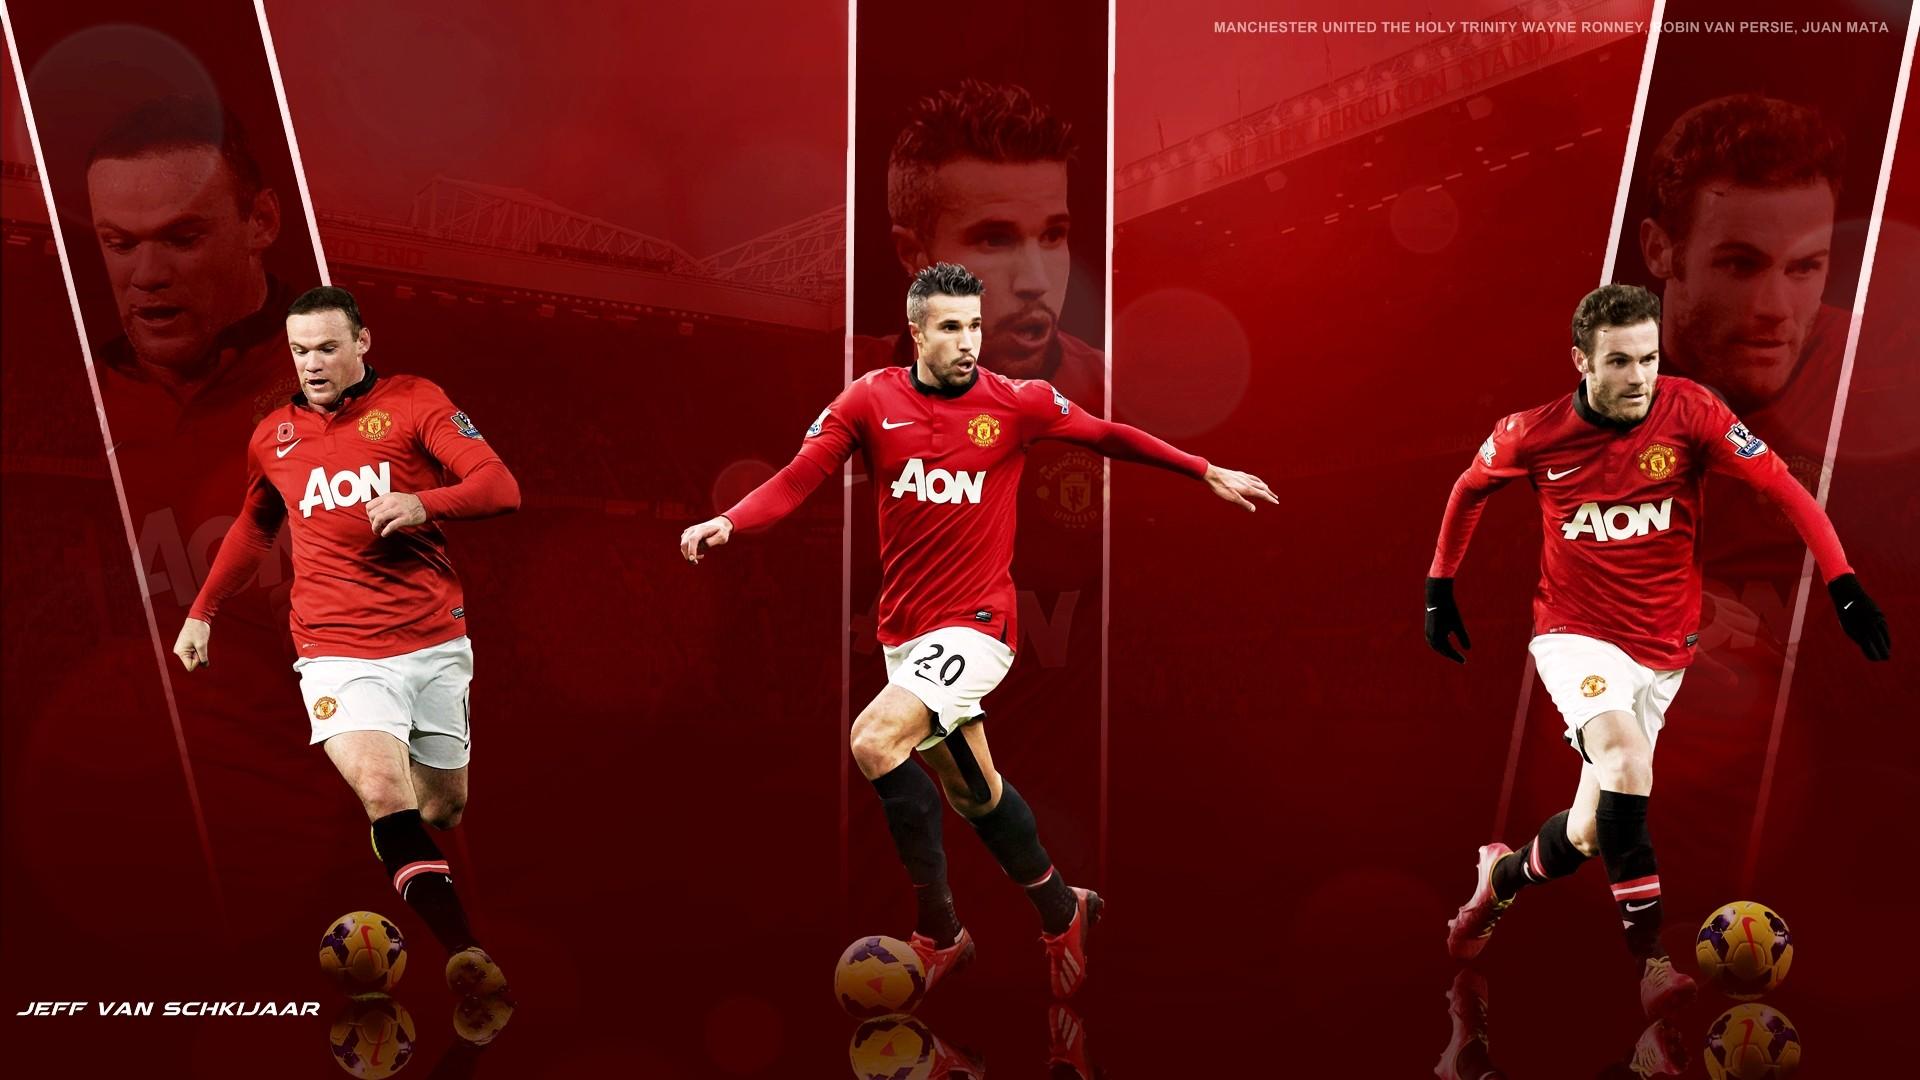 Wayne Rooney Robin Van Persie And Juan Mata Manchester 1920x1080